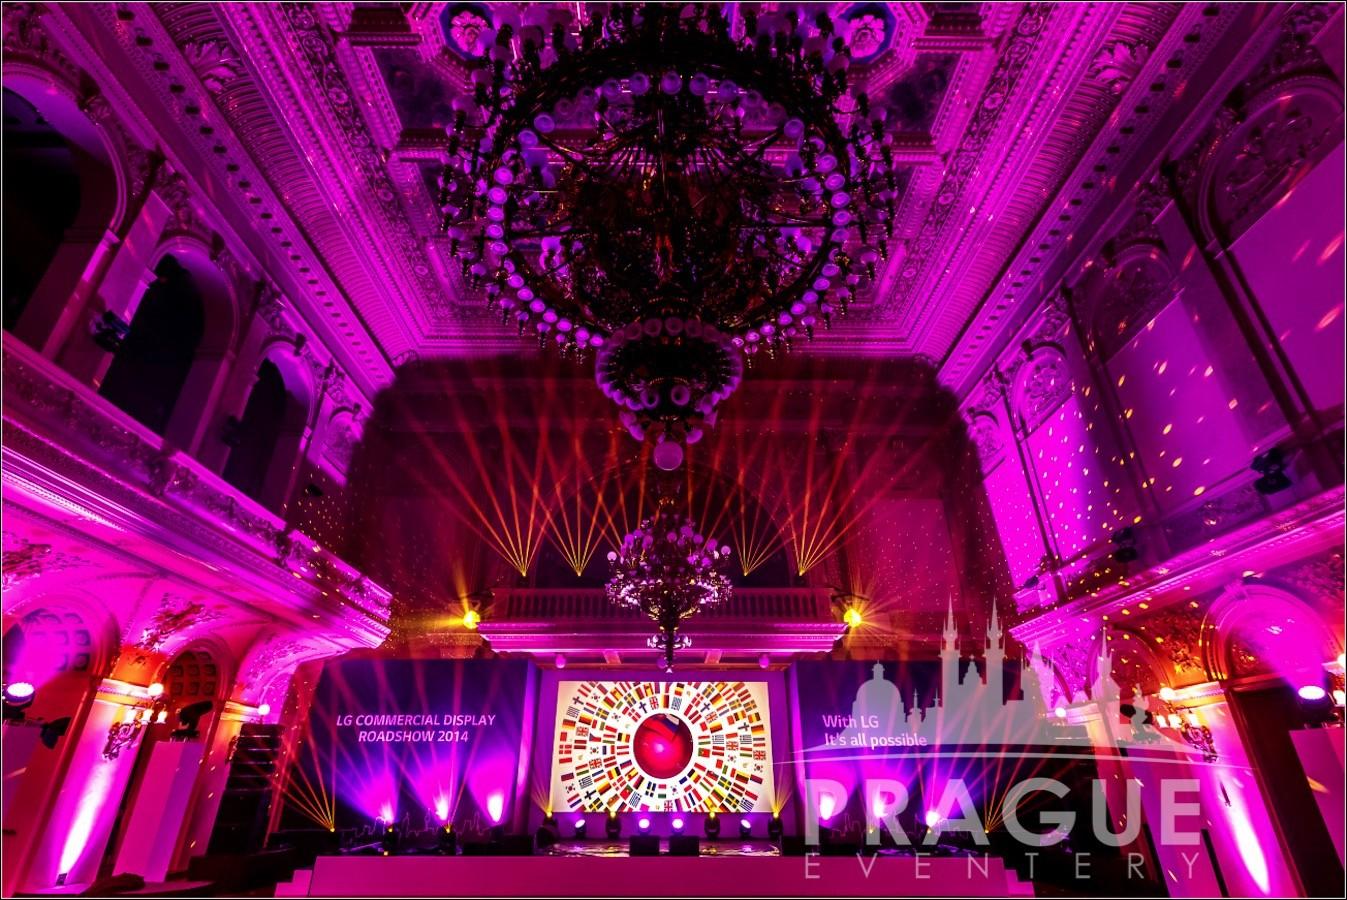 Prague conference venue, Tips to find exquisite Prague conference venues